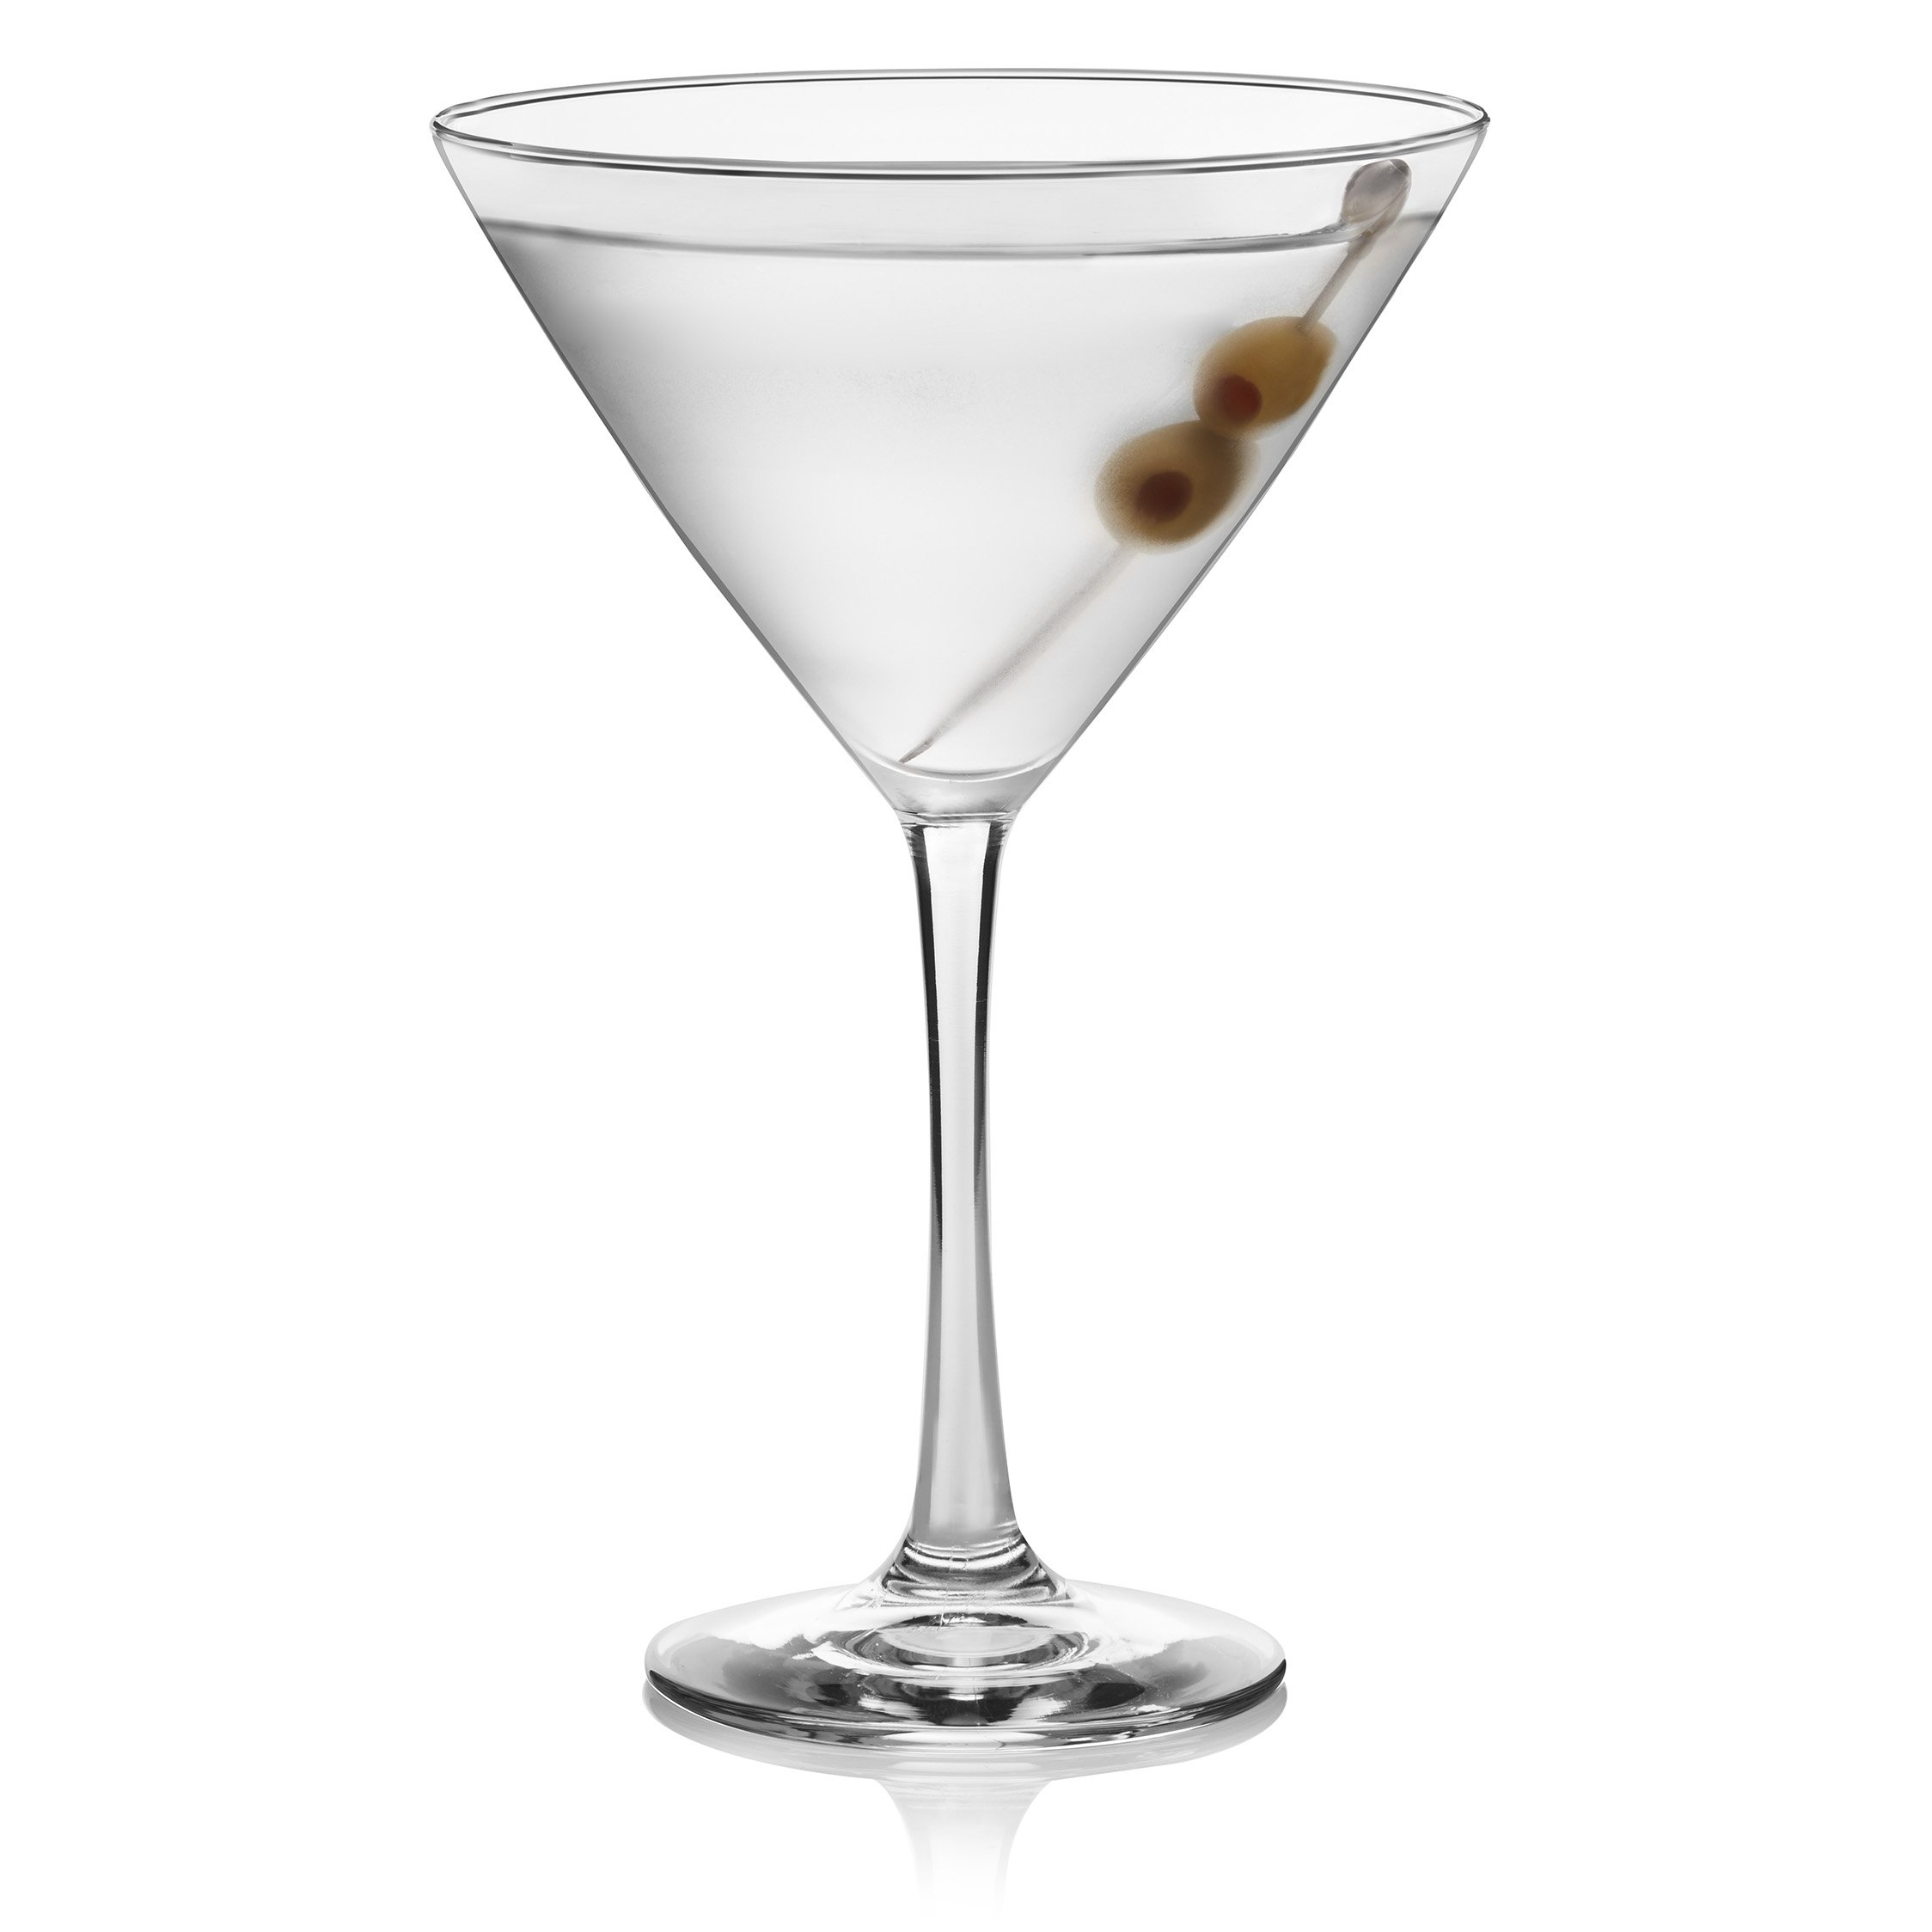 Libbey Vina Martini Glass Set, 6-12 ounce Martini Glasses, 7.38 inch height, Lead-Free